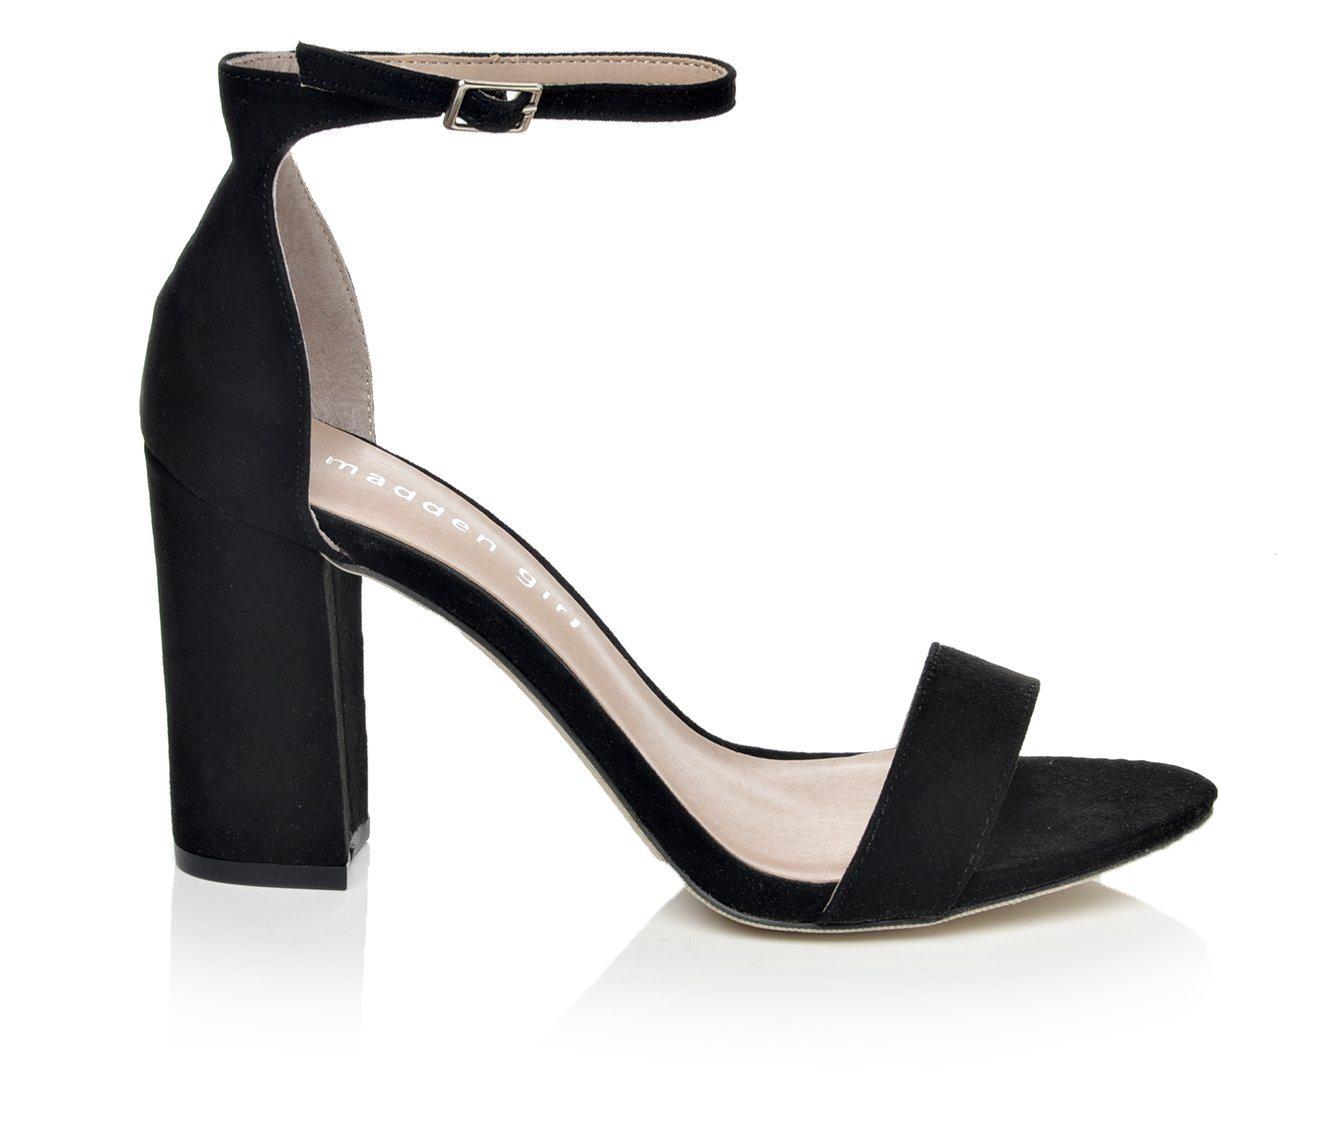 Madden Girl Beella Women's Dress Shoe (Black Canvas)